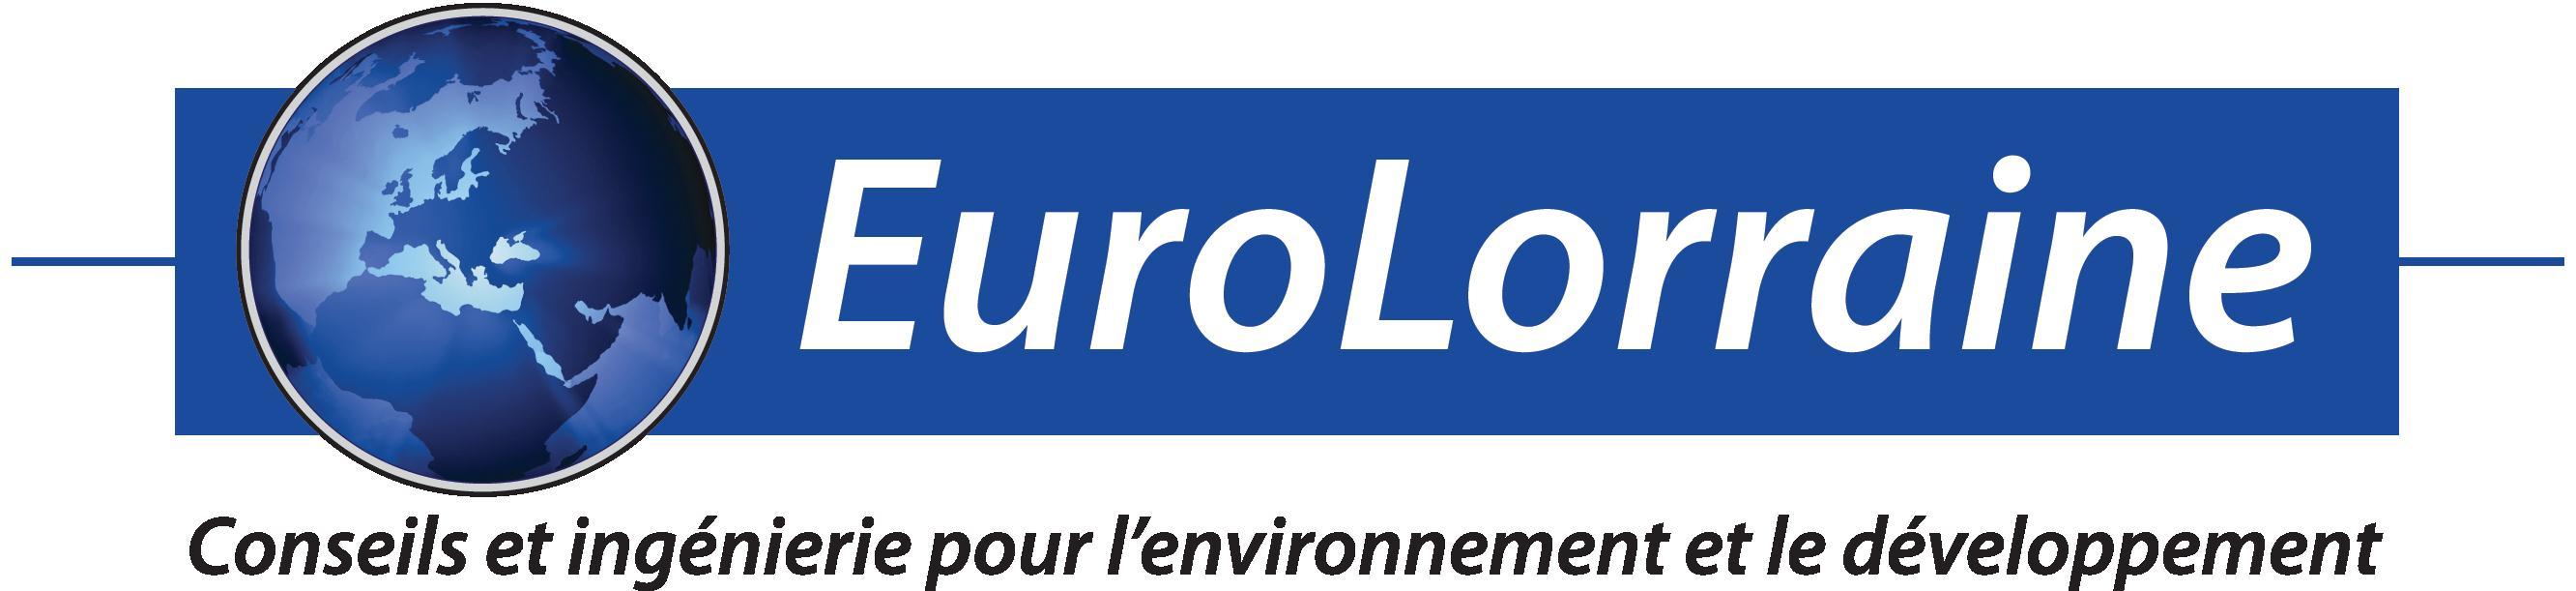 eurolorraine